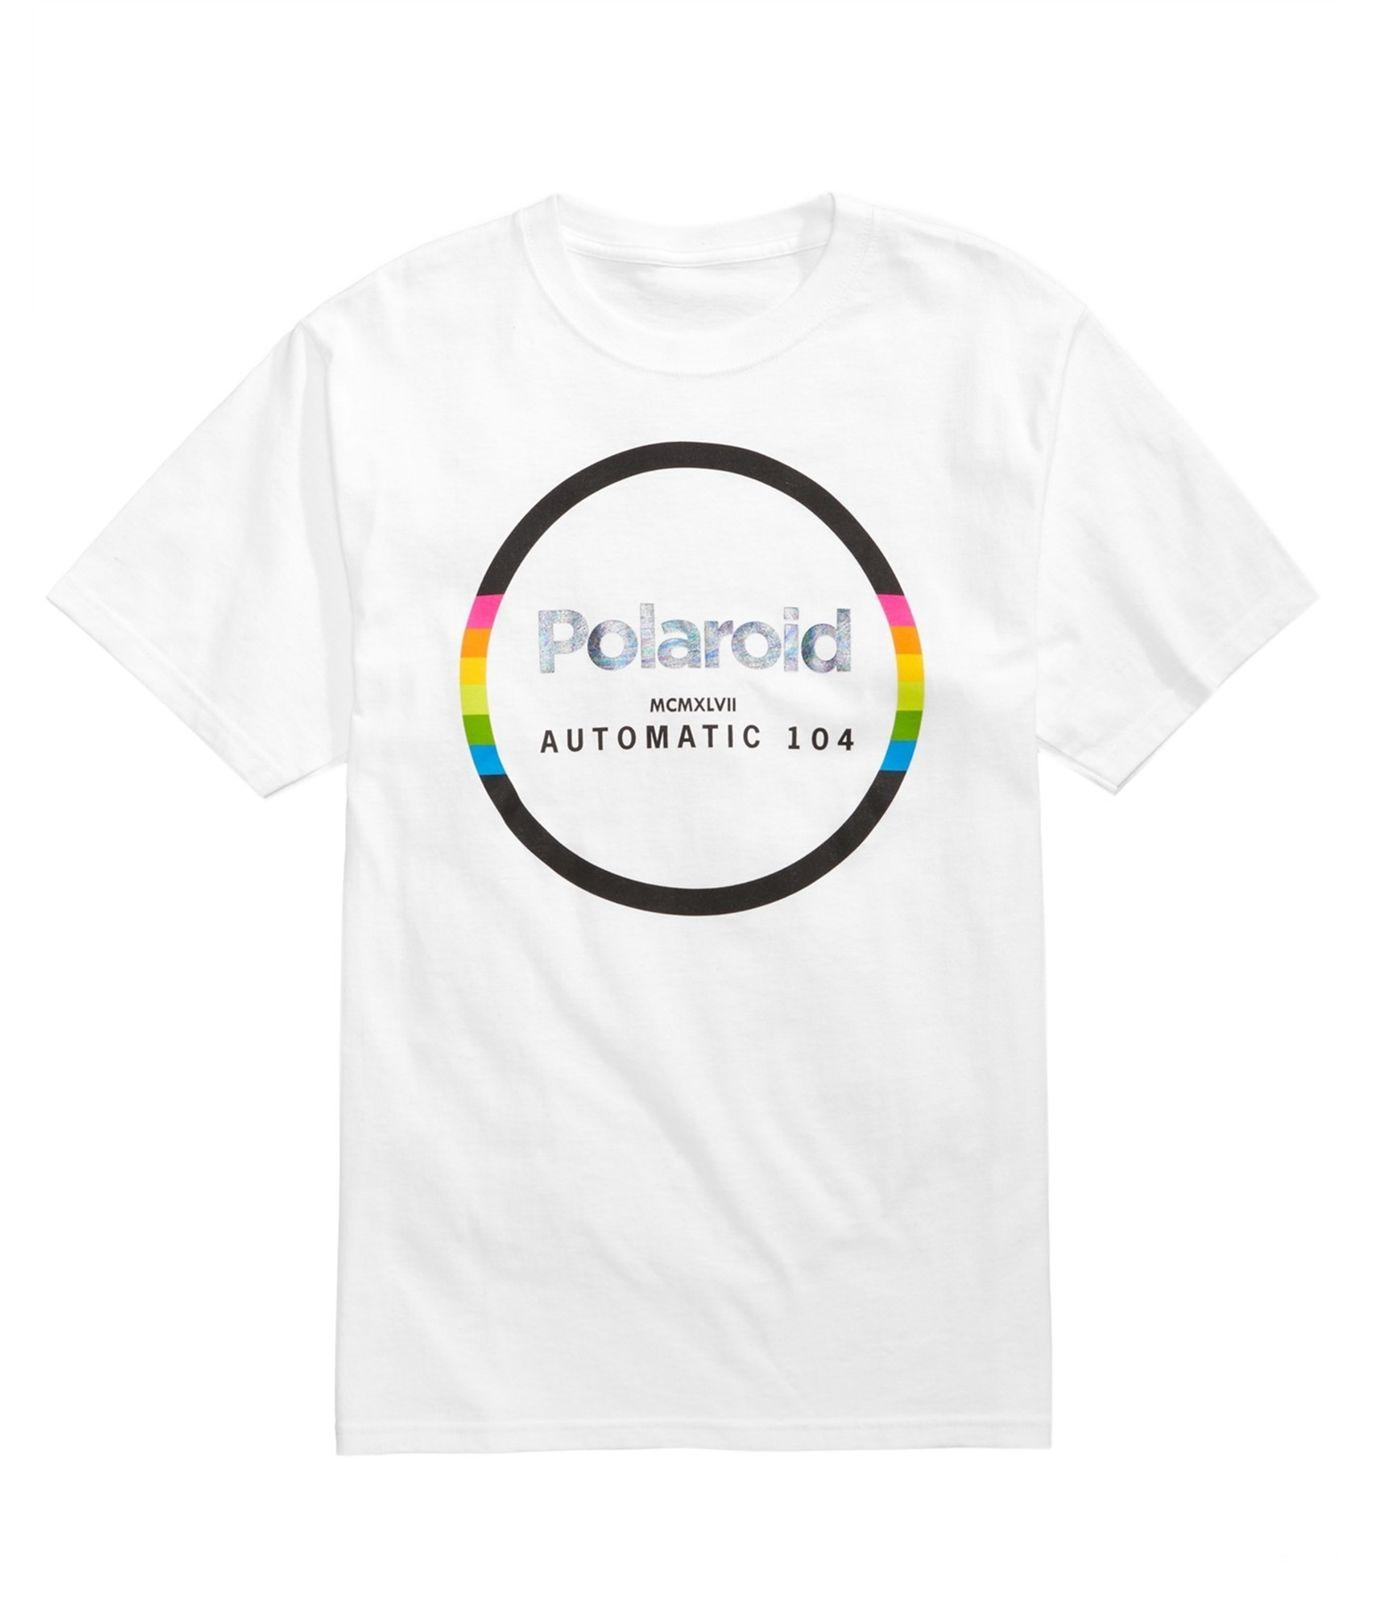 625efa667c55d1 Polaroid Mens Automatic 104 Graphic T Shirt Men Women Unisex Fashion Tshirt  Funny Cool Top Tee Black Latest T Shirt Designs Coolest Shirts From ...